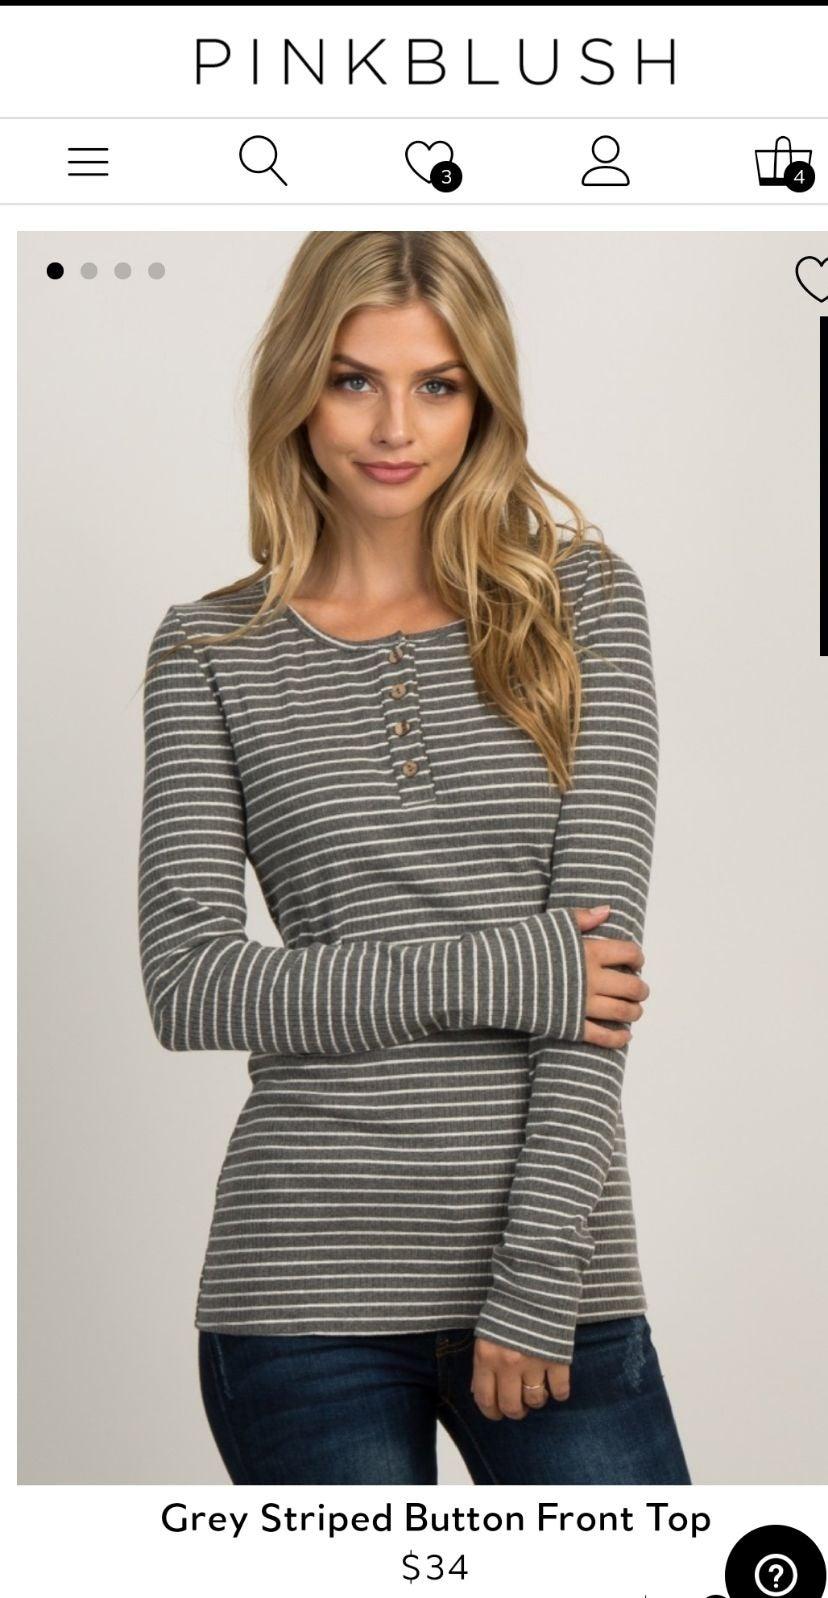 Pinkblush Small Striped Grey Henley NEW